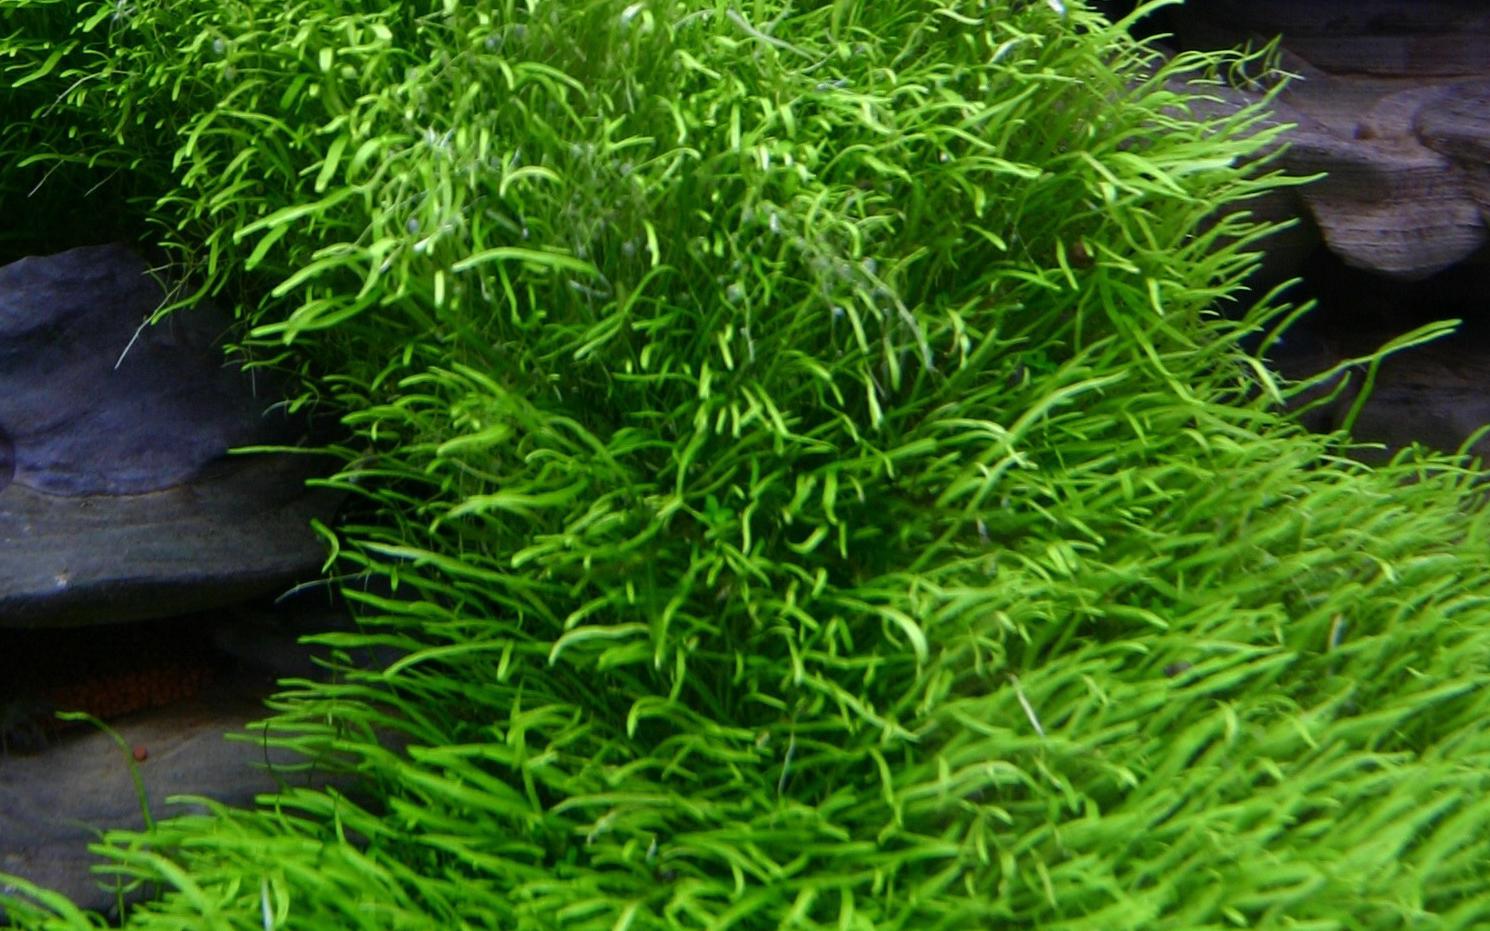 In Vitro Planzen Bonsai Garnelen Aquaristik Wettstein Alles Rund